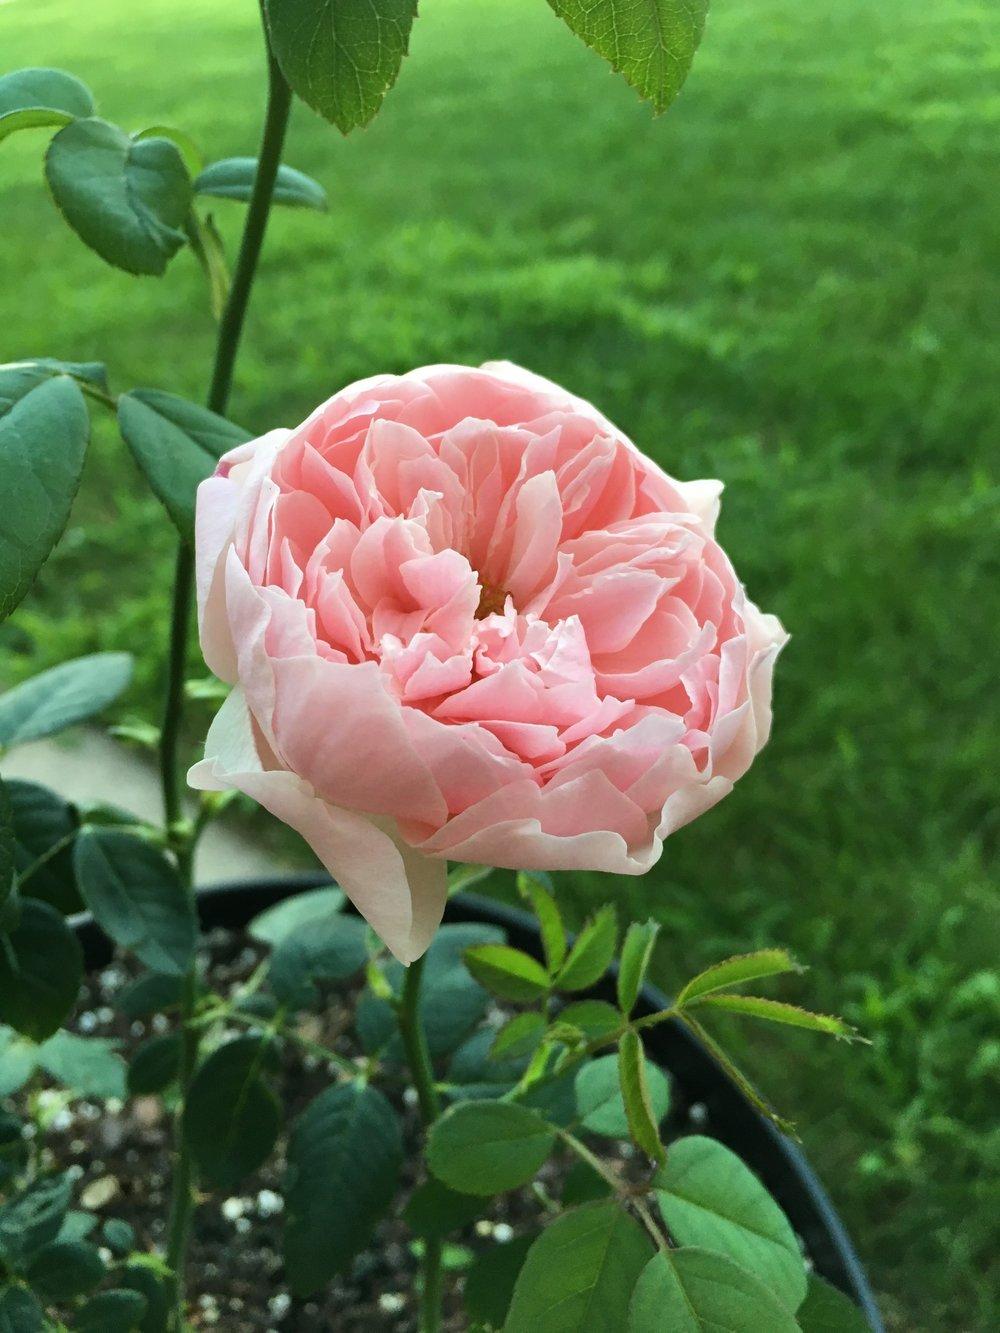 'Alnwick' rose by David Austen